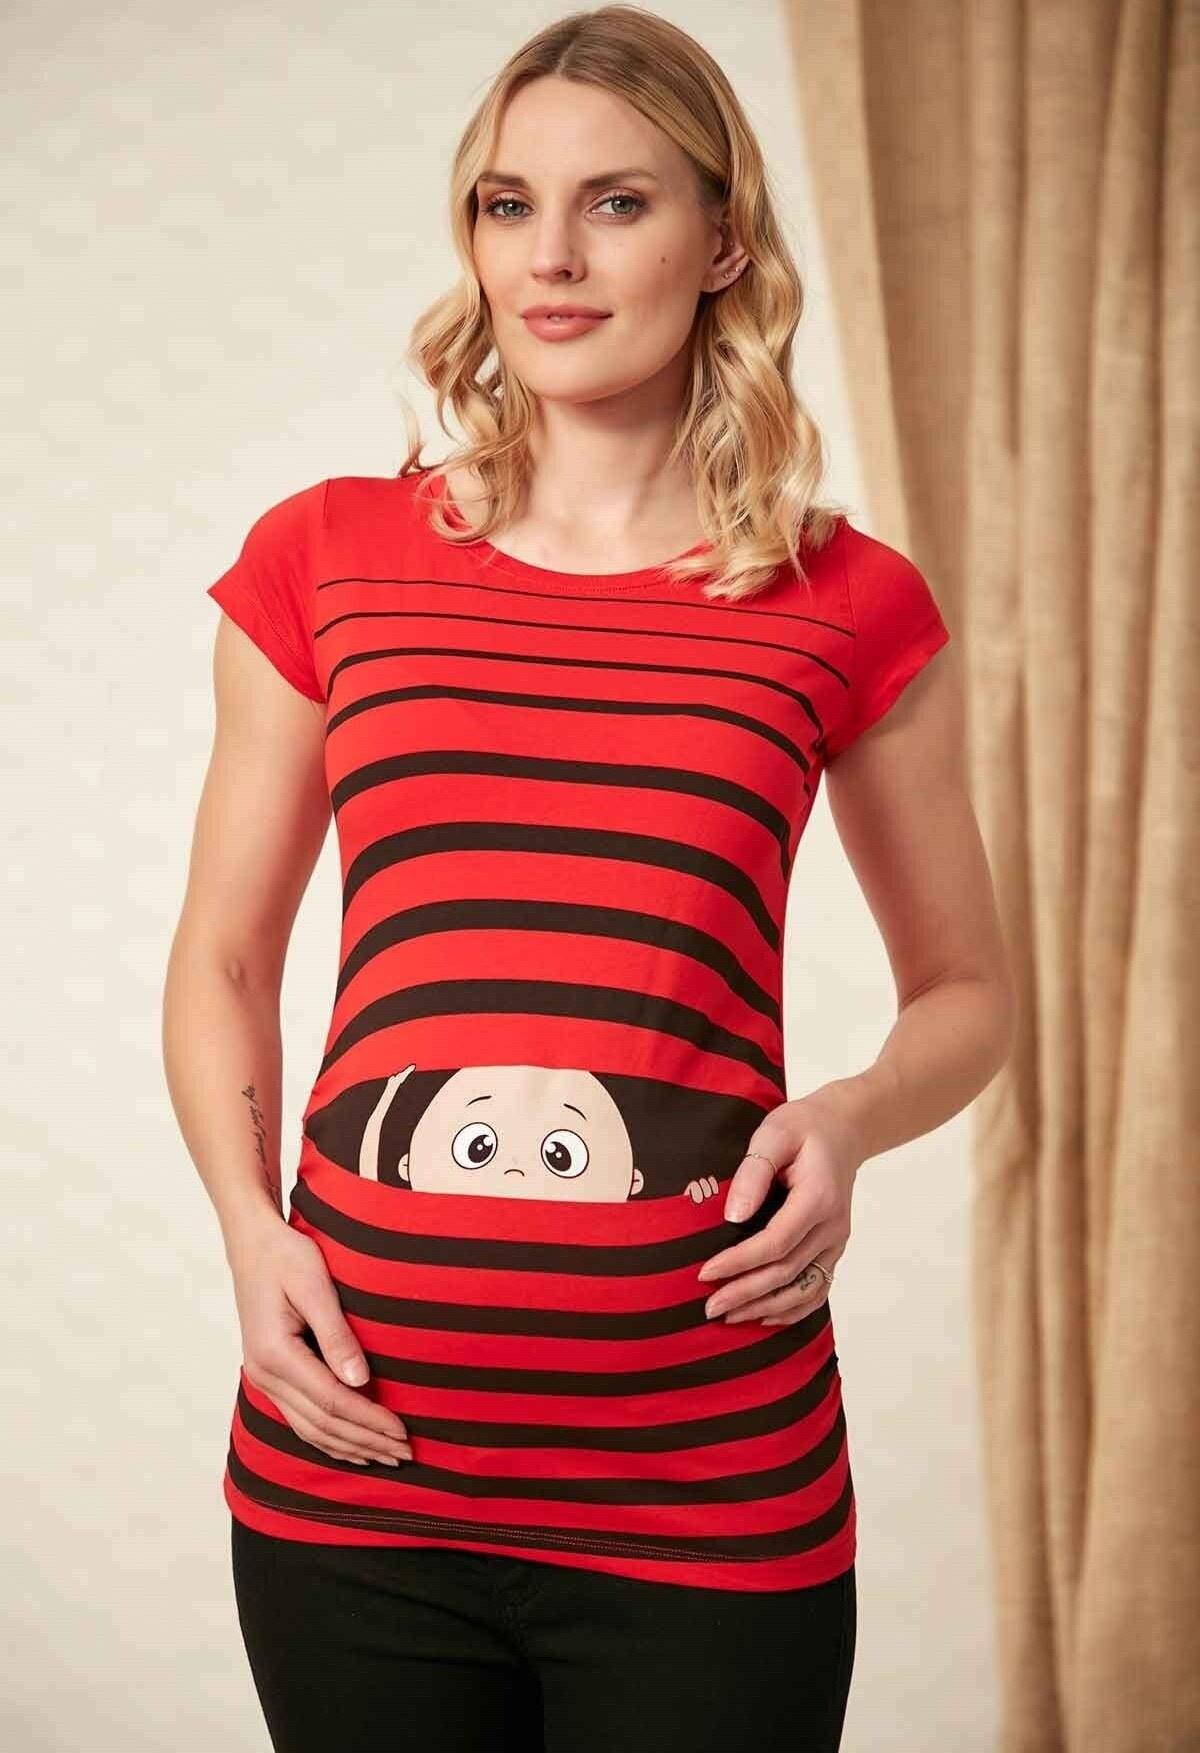 image تی شرت کودک بارداری چاپی قرمز برند Gör&Sin کد 1613197322